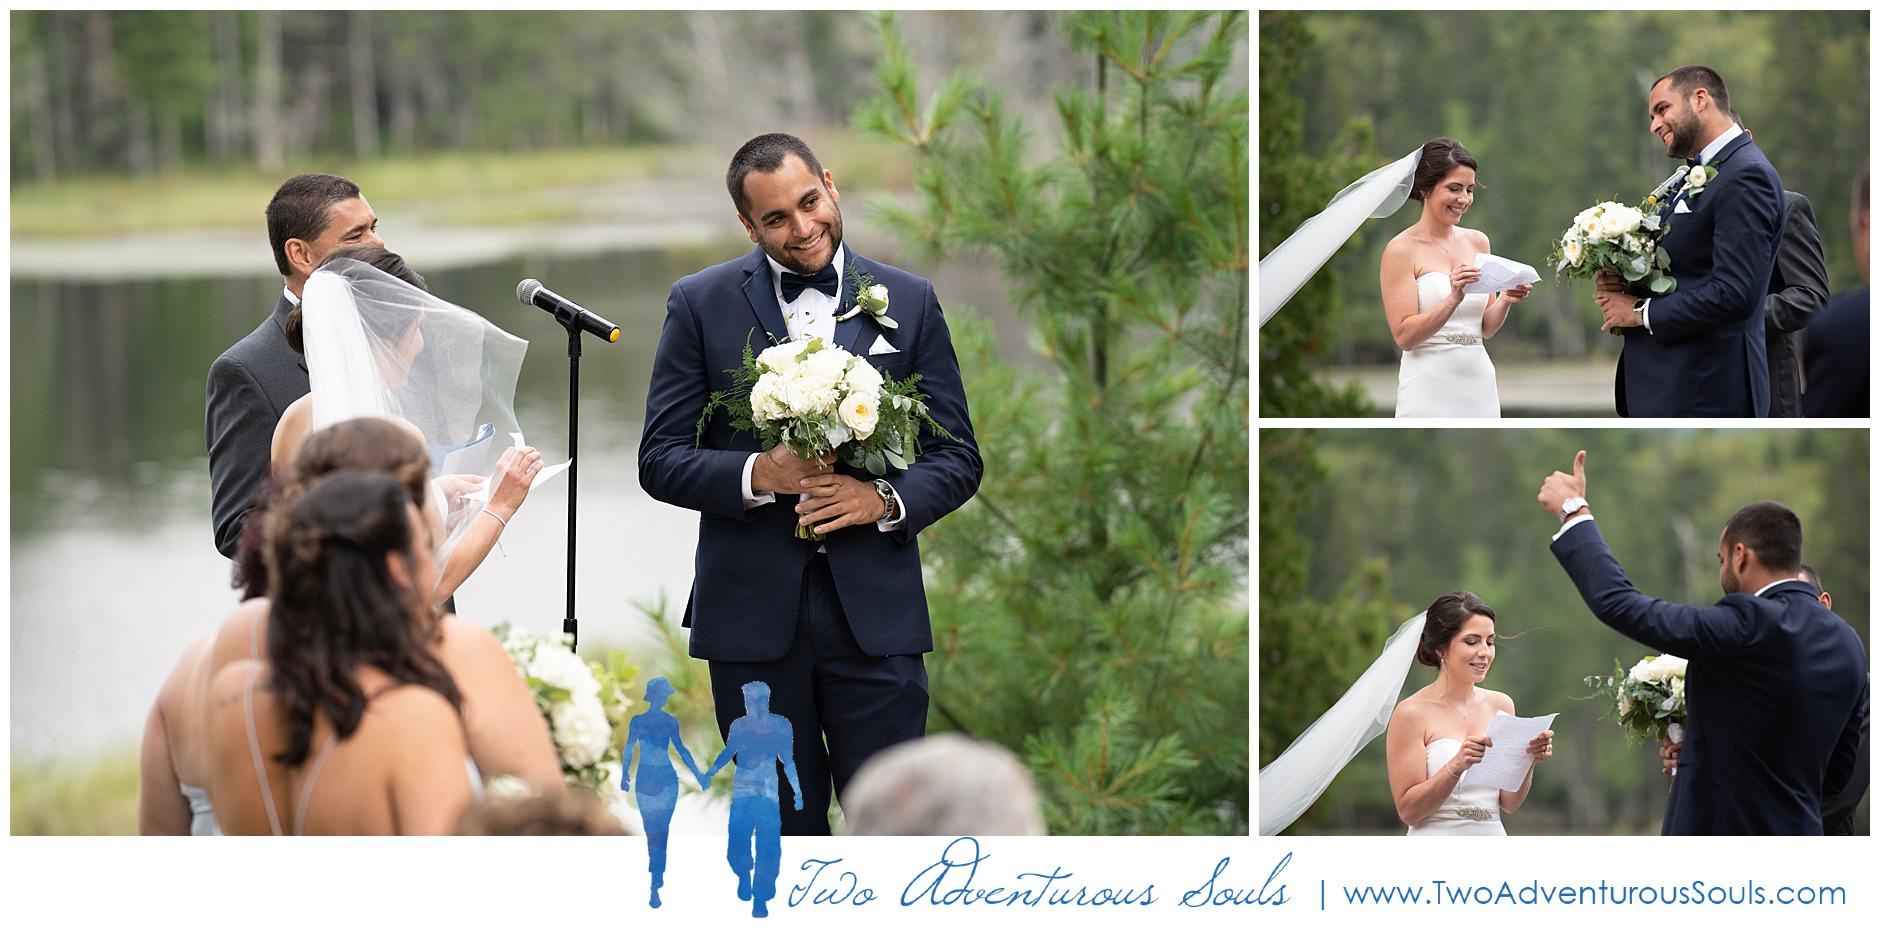 Sugarloaf Outdoor Center Wedding Photographers, Destination Wedding Photographers, Two Adventurous Souls-081719_0038.jpg